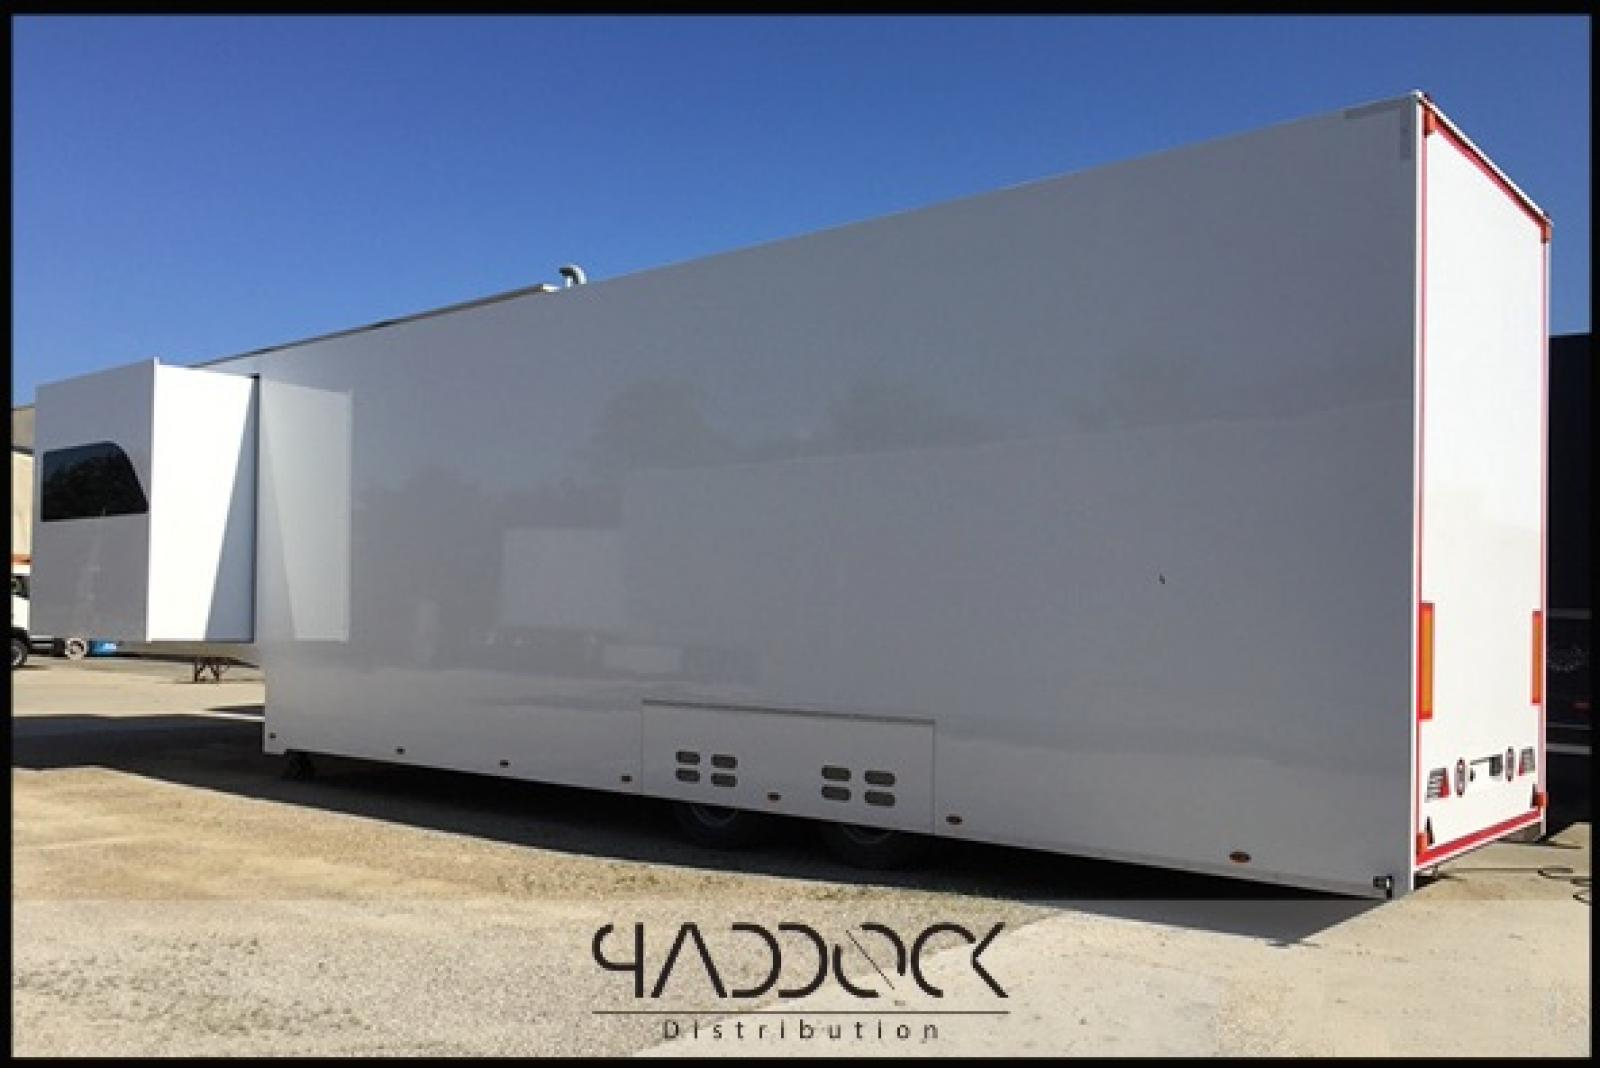 ASTA CAR Z3 SLIDE TRAILER BY PADDOCK DISTRIBUTION - 2